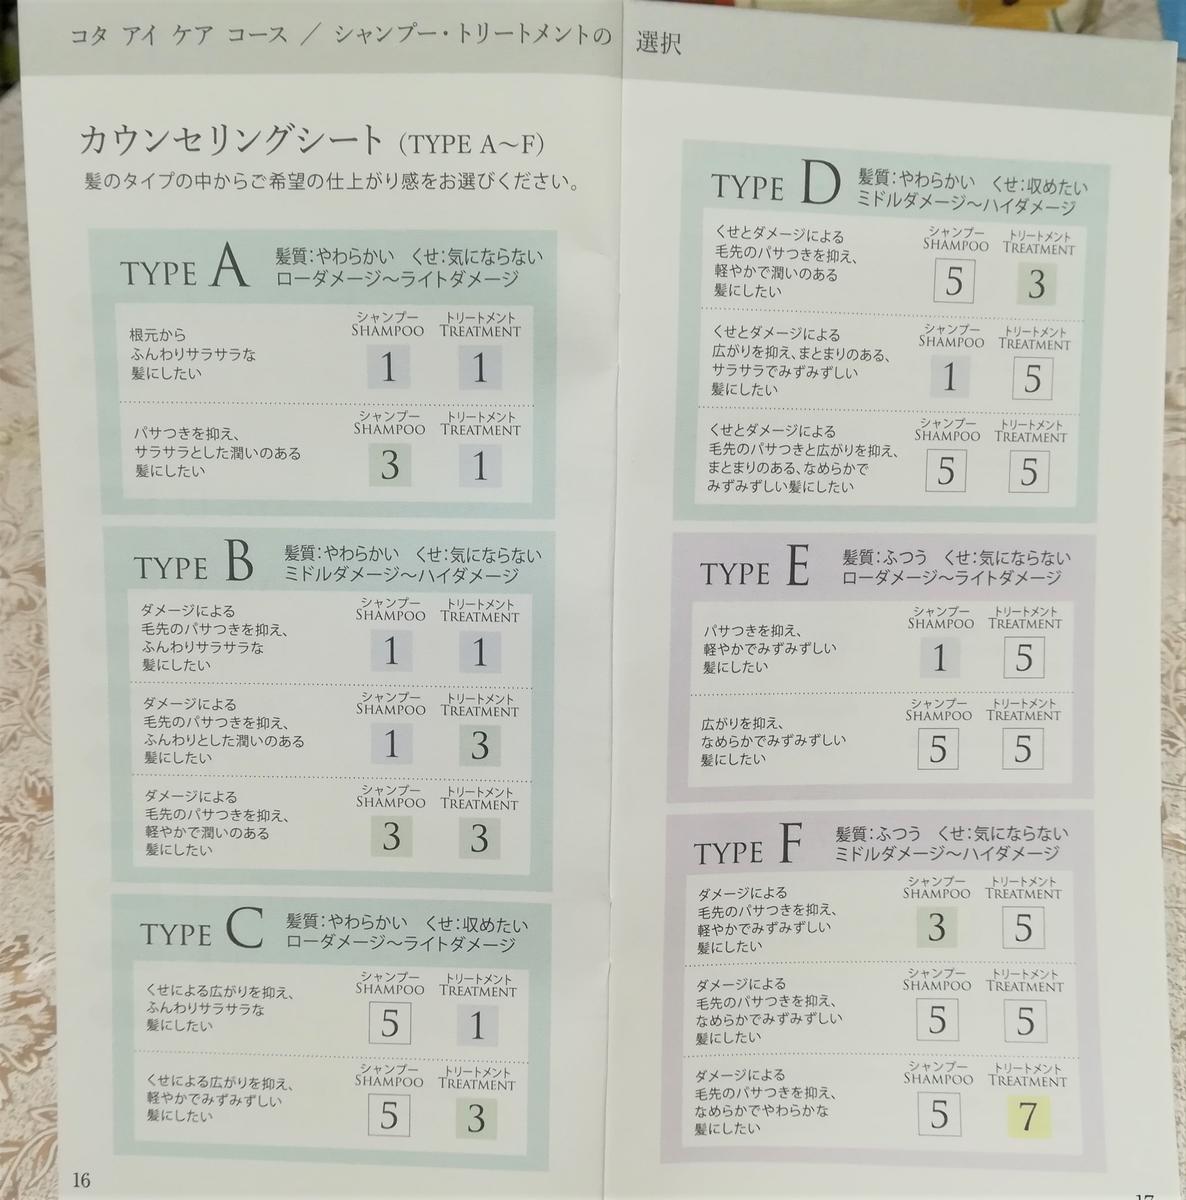 f:id:japantk:20190528101359j:plain